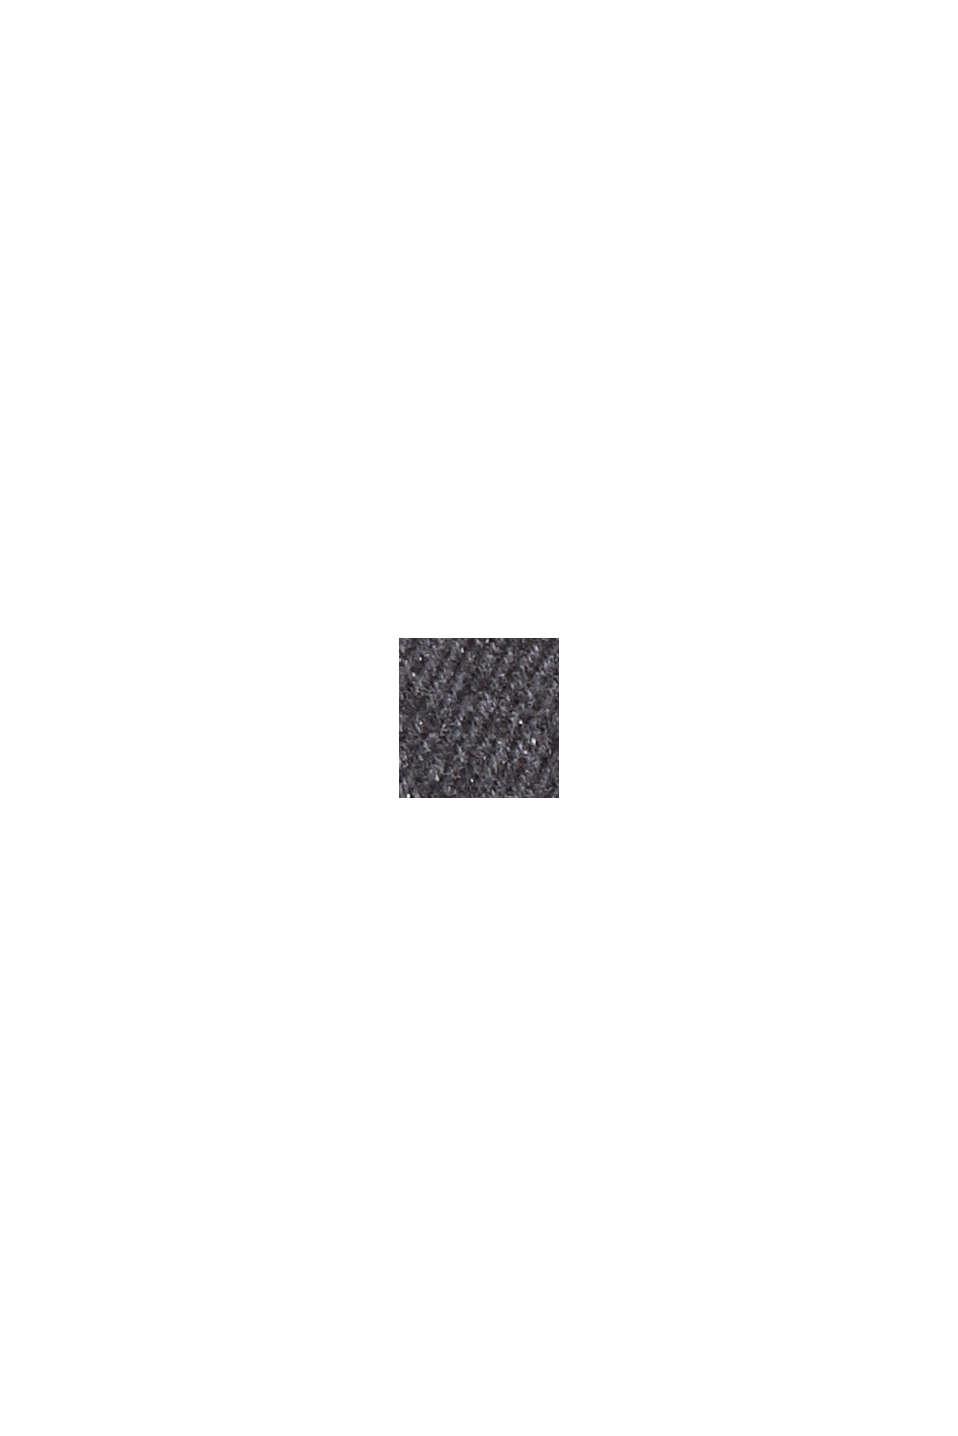 Jean court authentique en coton biologique, GREY DARK WASHED, swatch